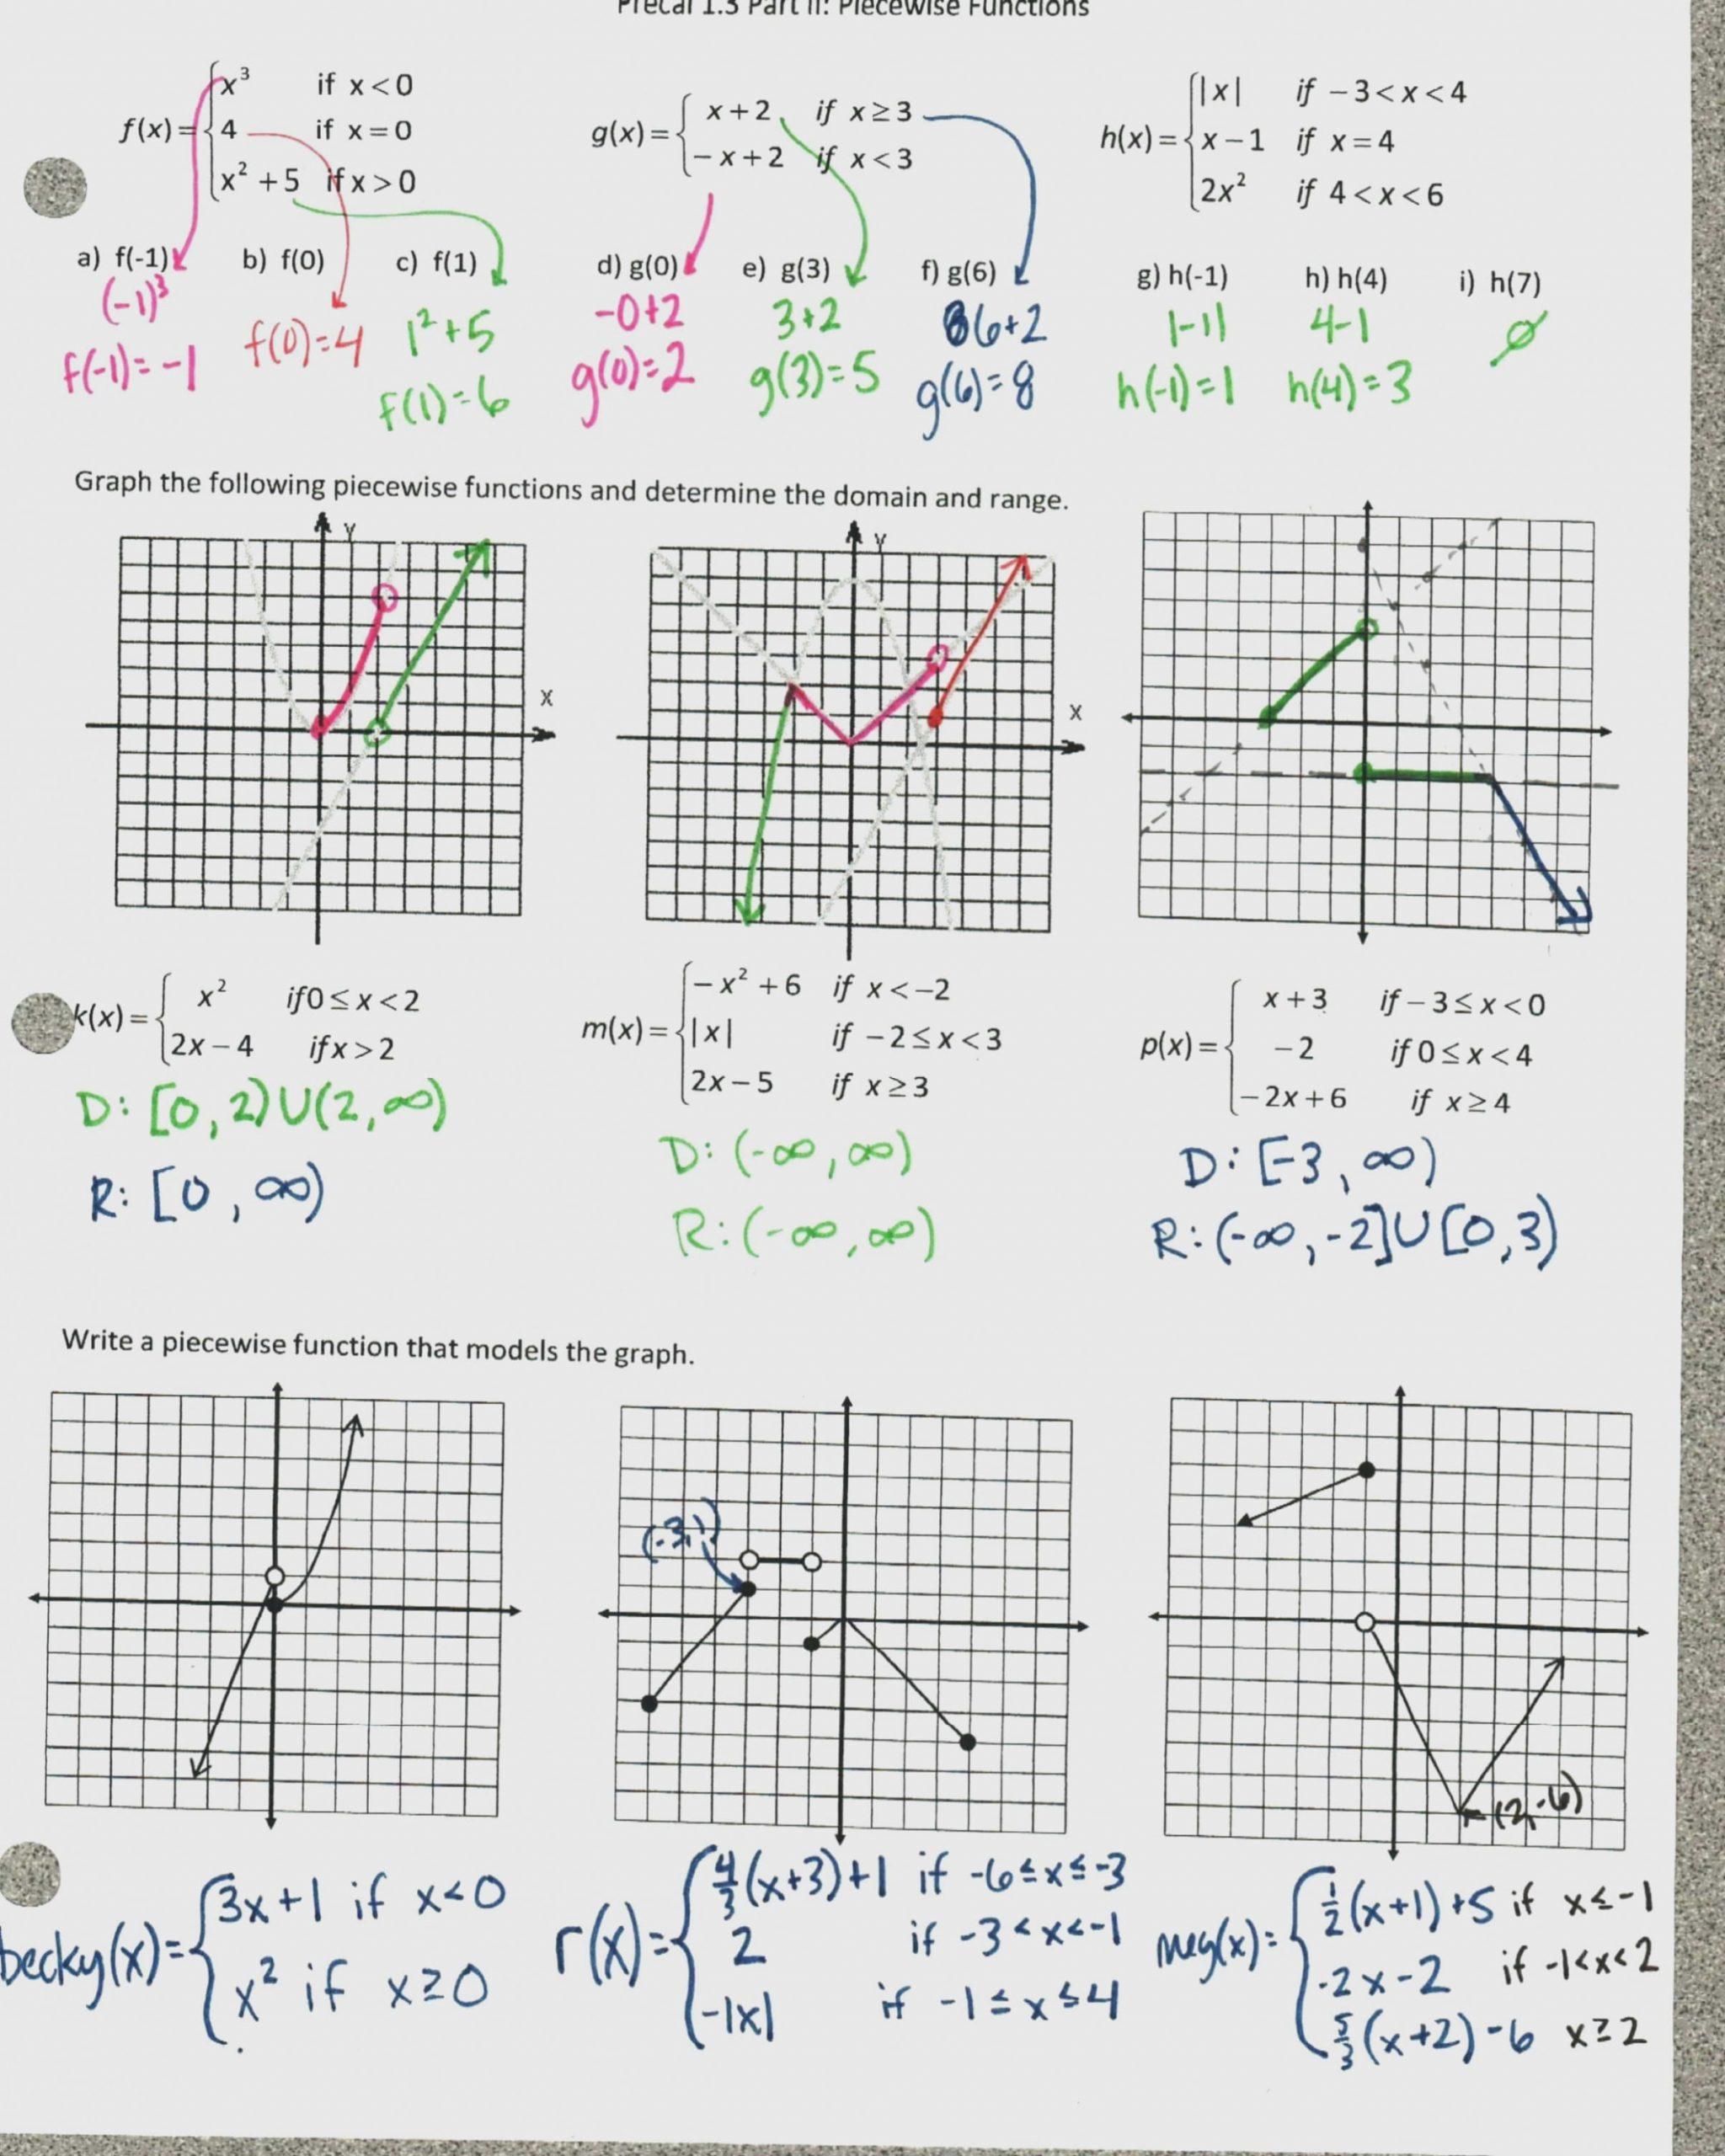 Graphing Trig Functions Practice Worksheet Graphing Sinusoidal Functions Worksheet